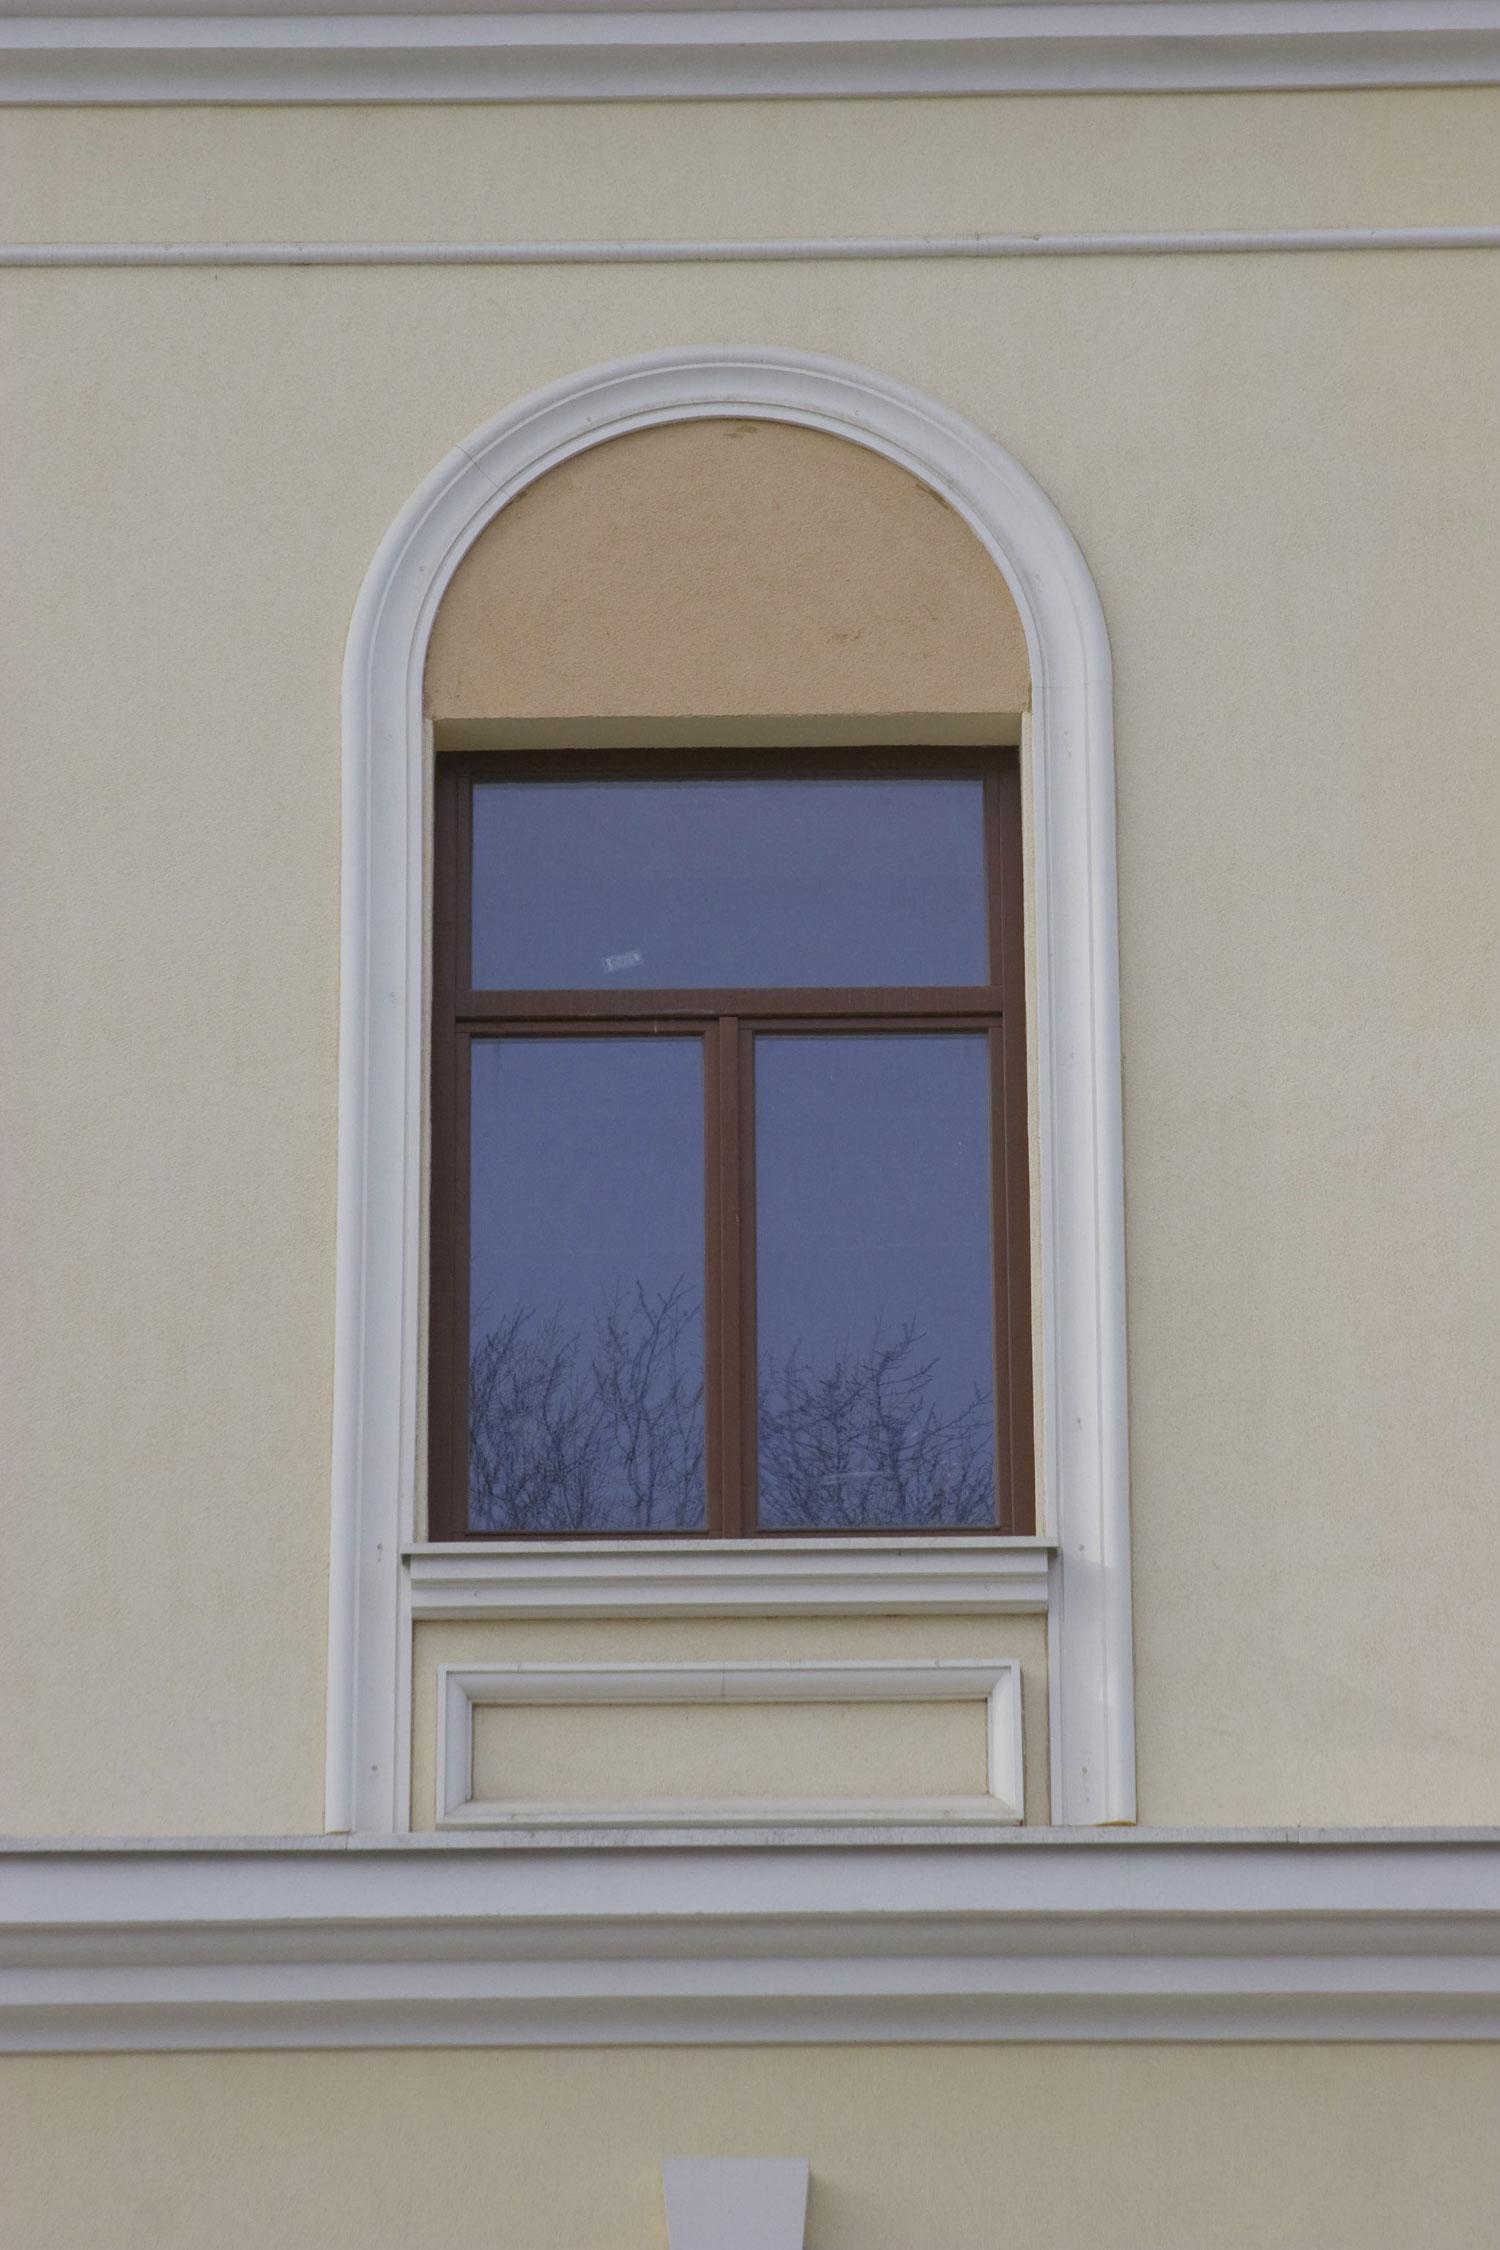 фото обналички на окна из полиуретана том, что возраст